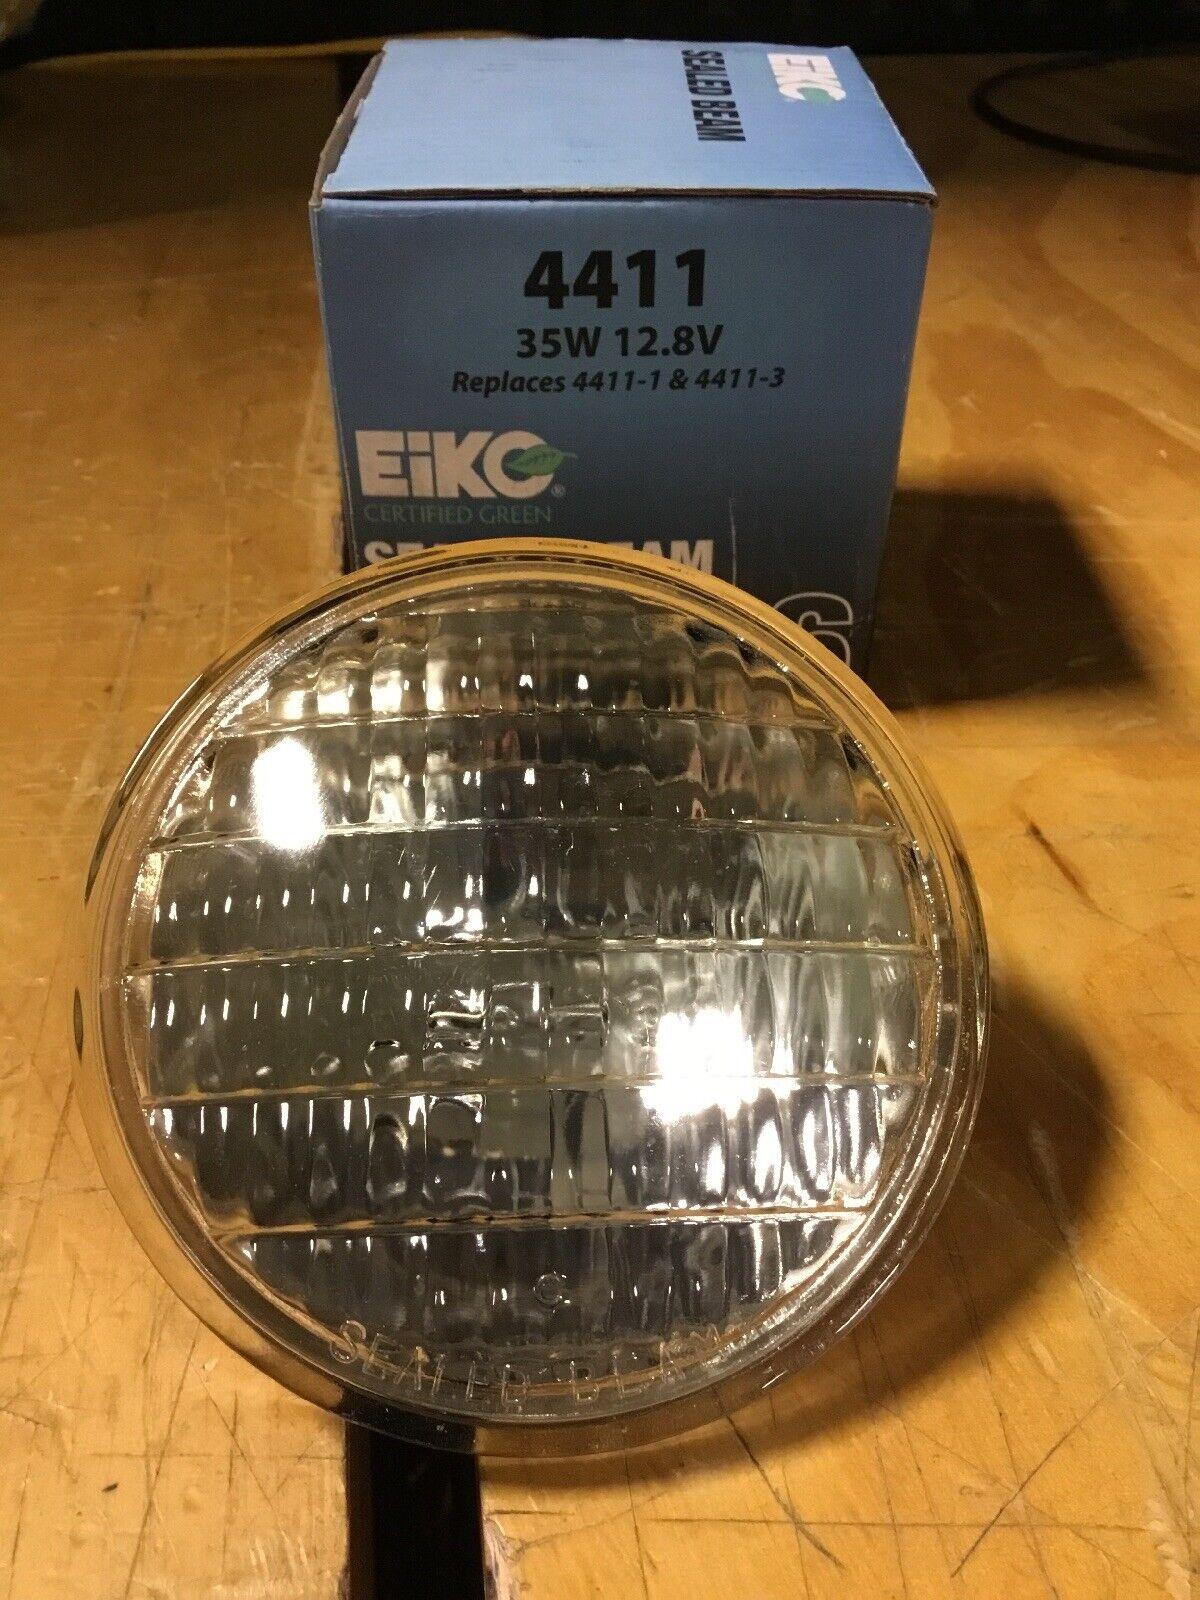 ONE PAIR 4411 Halogen Sealed Beam Lamp PAR36 35W replaceable bulb fog lamp